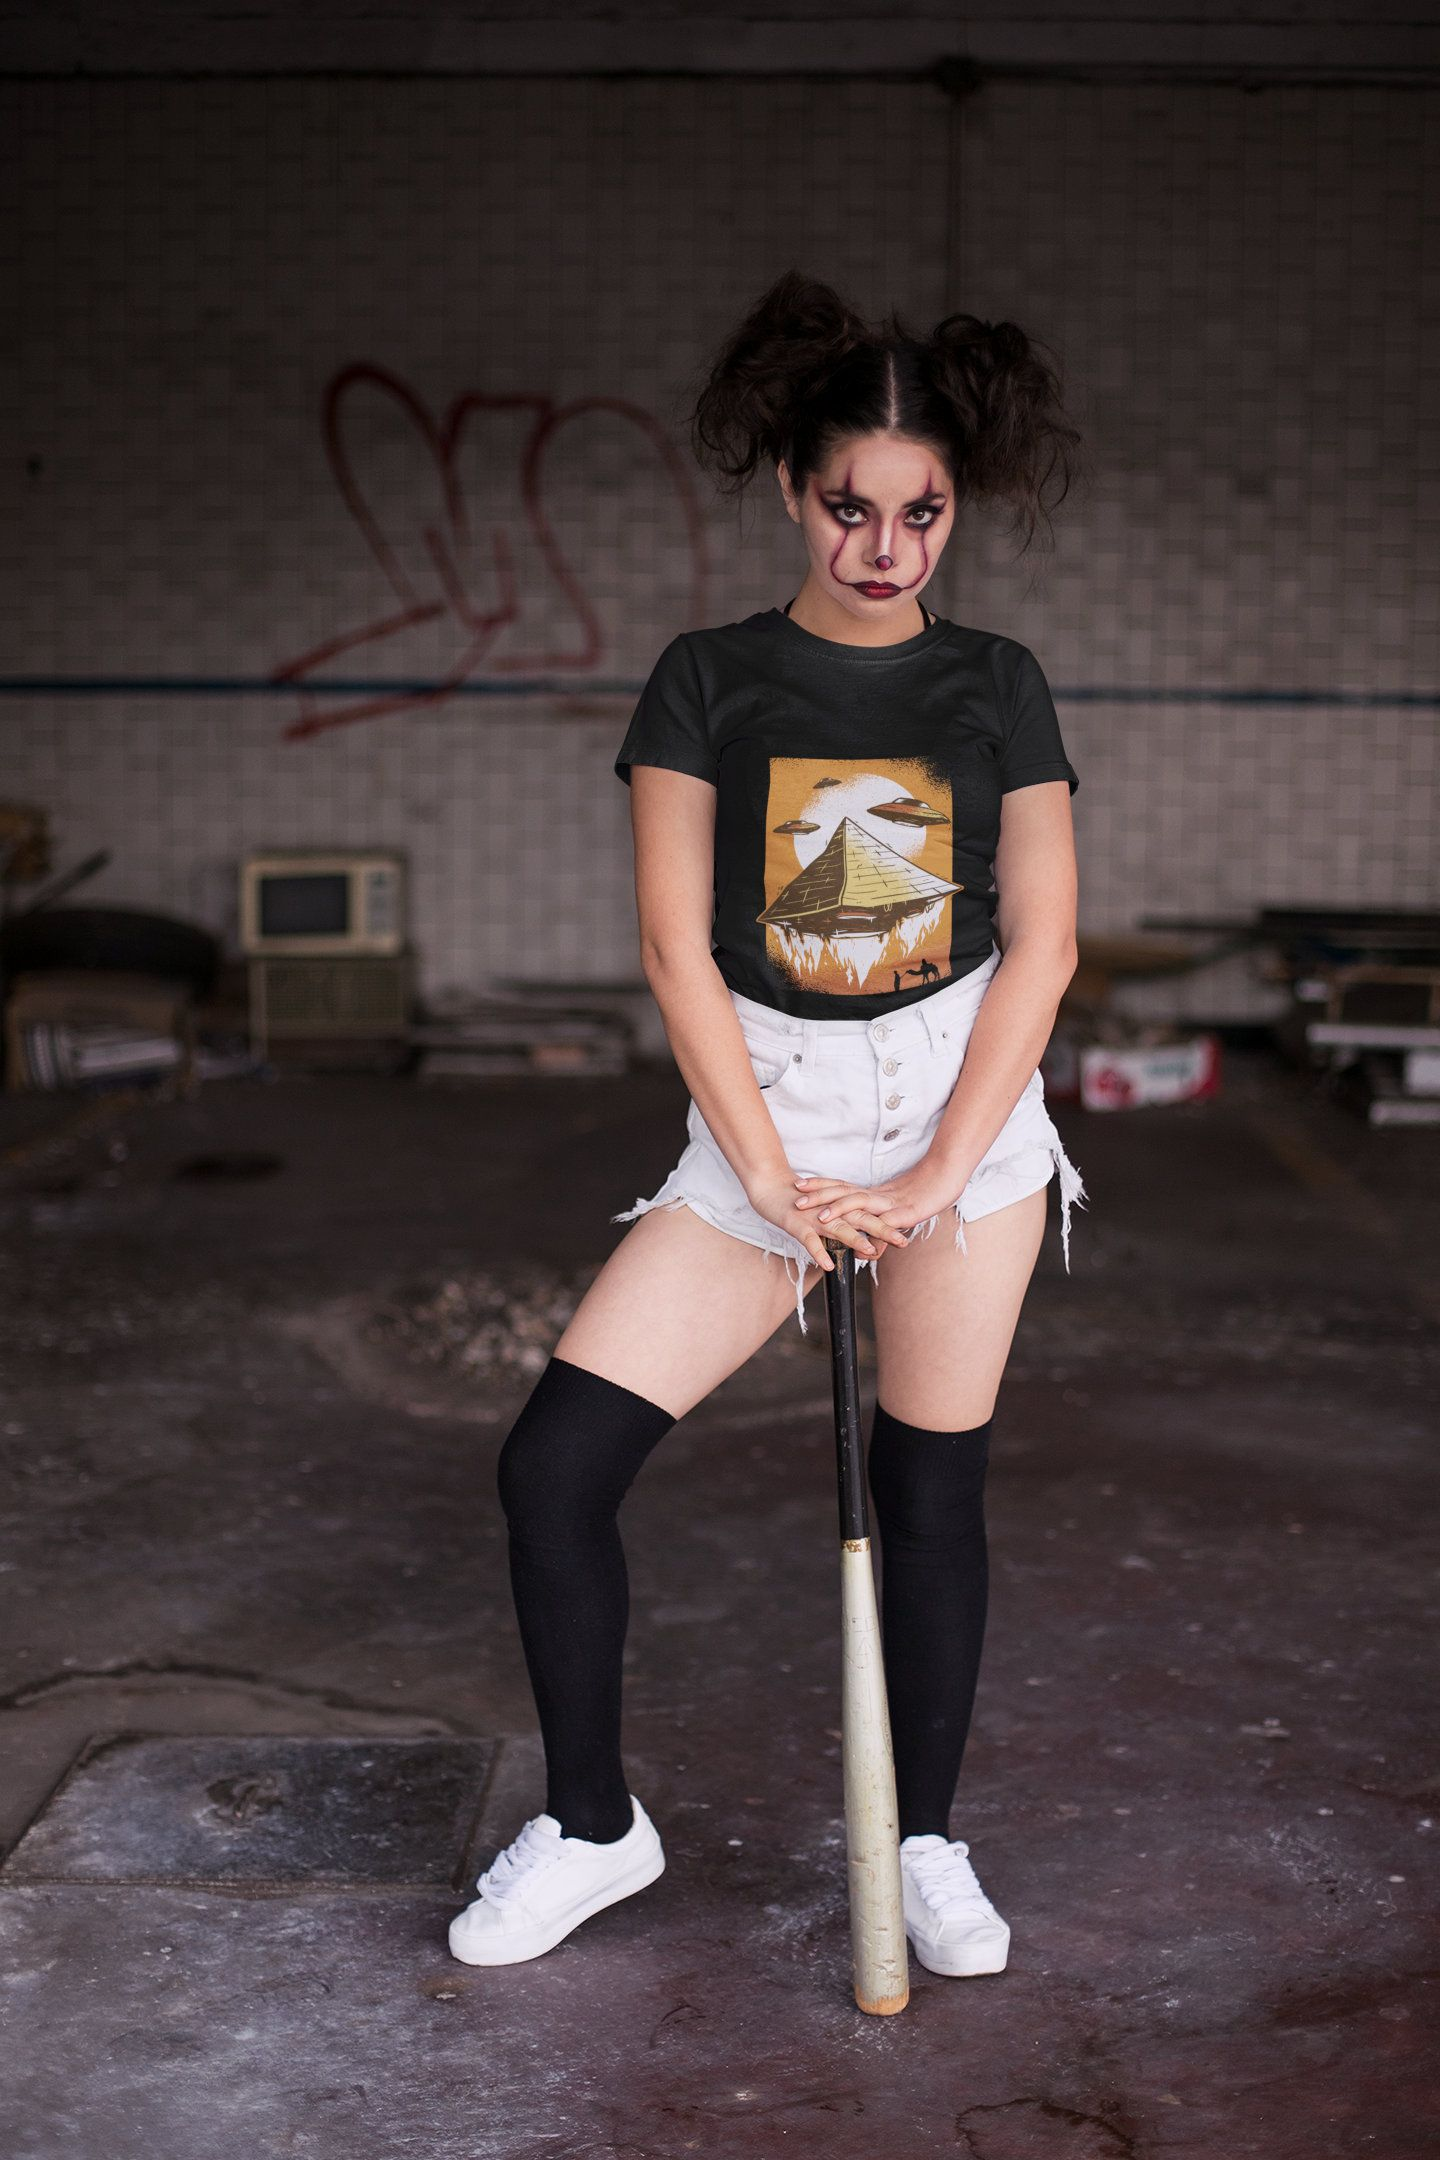 Ufo Shirt, UFO Pyramid Shirt,Alien Abduction ,Alien Shirt,Aliens Shirt,Area 51,Ufo Clothing,Ufo Egypt Short-Sleeve Unisex T-Shirt #area51partyoutfit